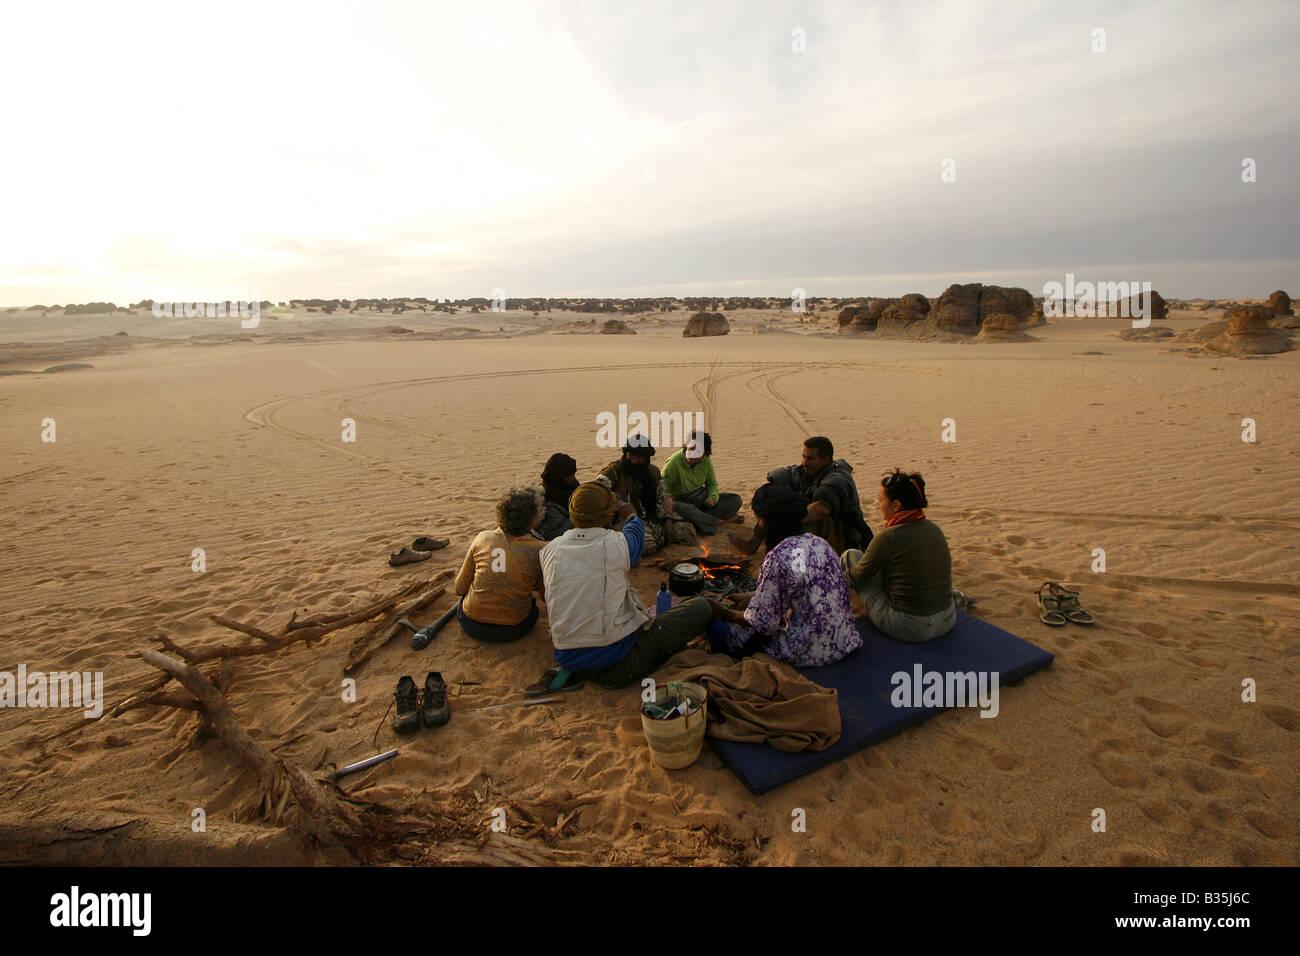 Tourists In Tehog Tassili Ahaggar Sahara desert Algeria - Stock Image